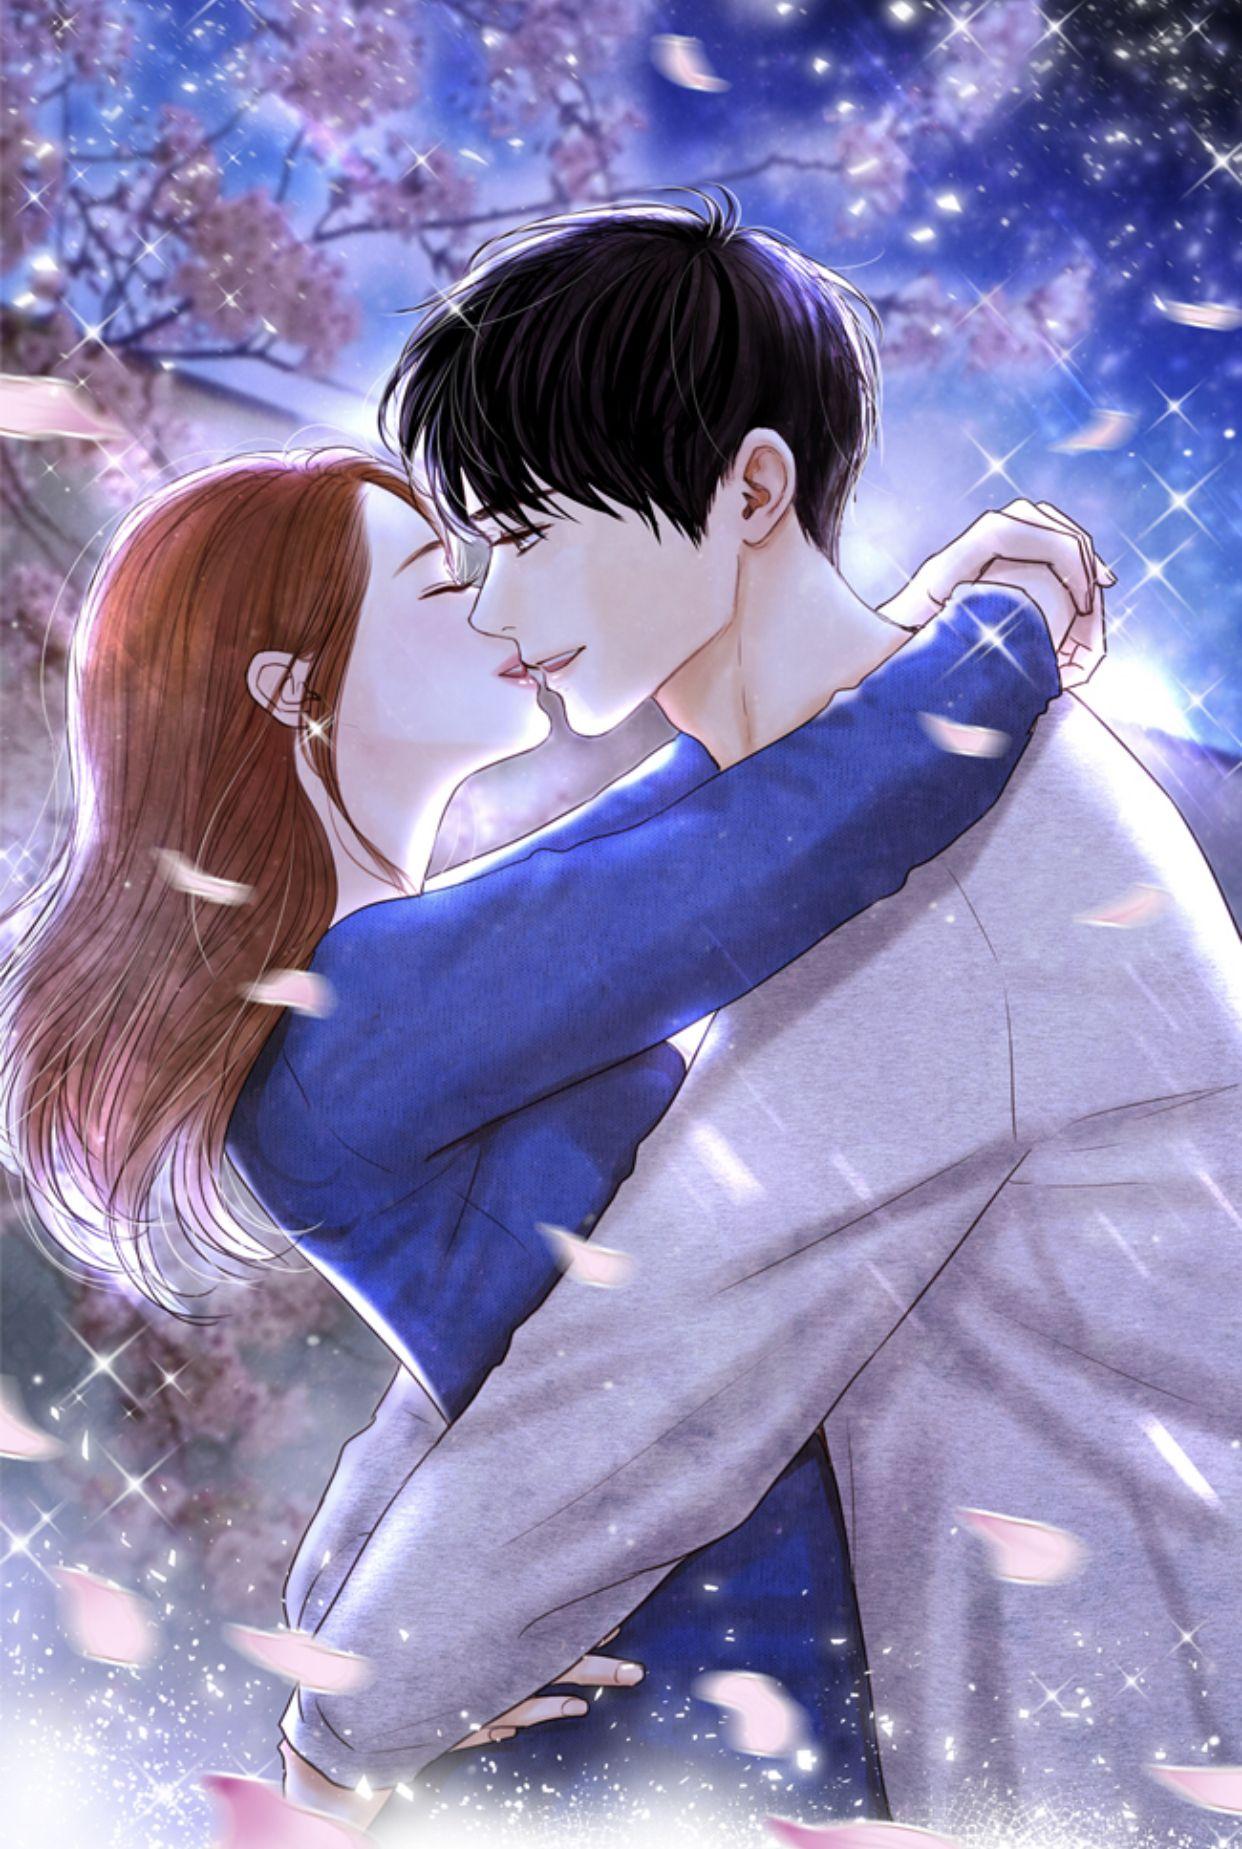 Pin by Animemangaluver on Star you (너라는 별) Manhwa / Novel